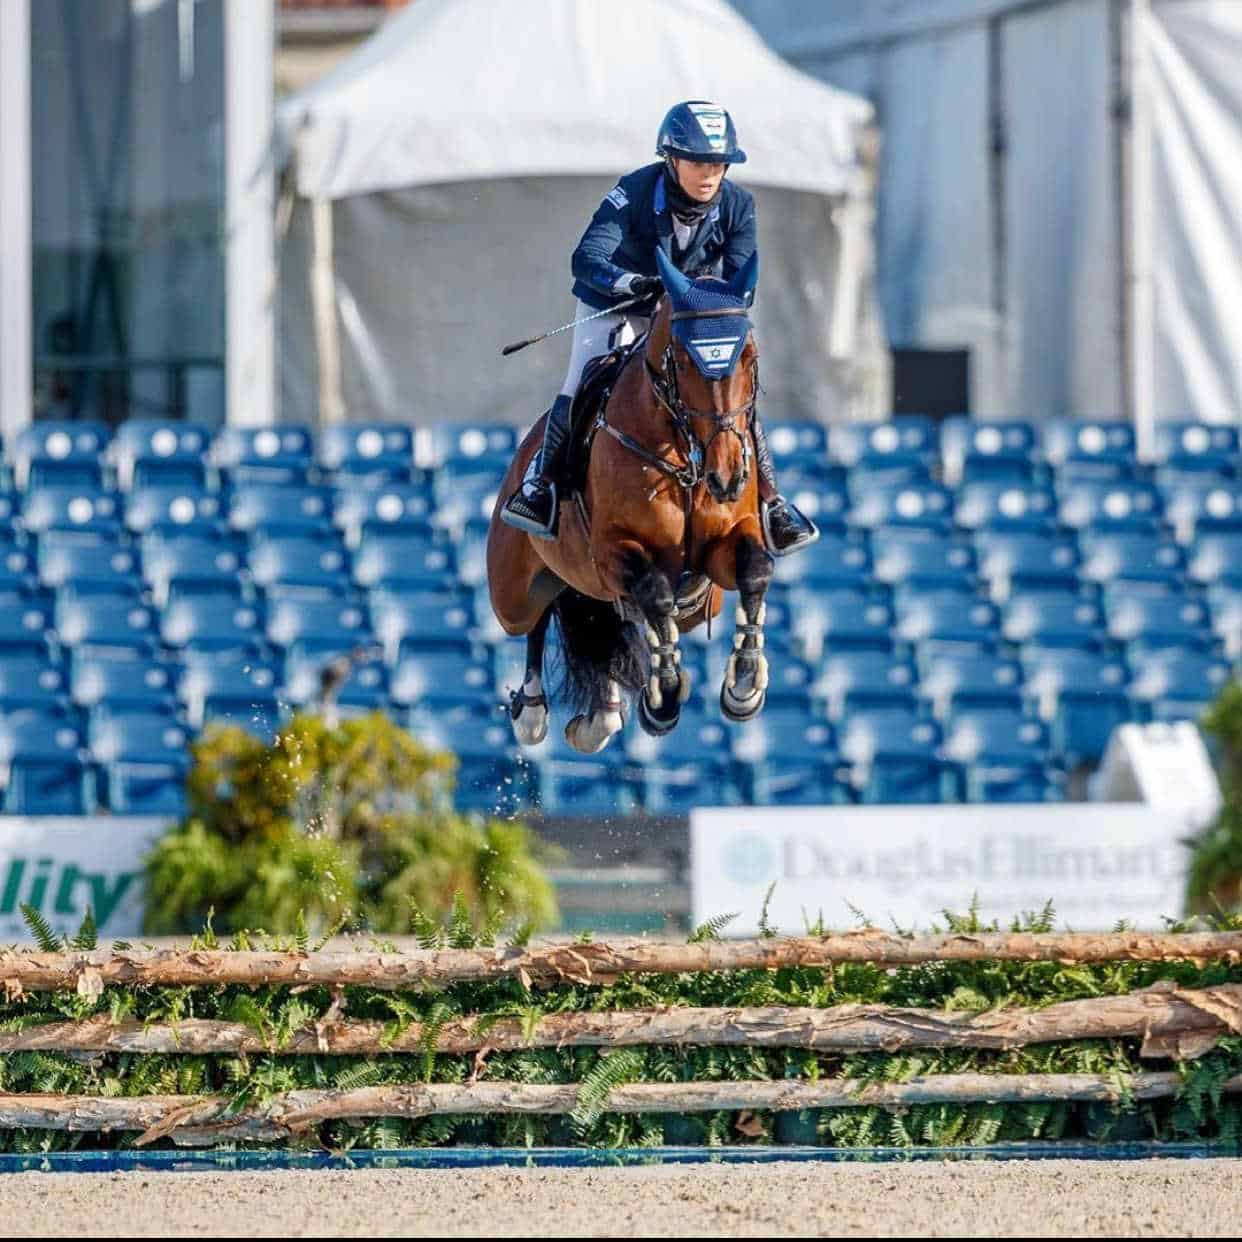 SynNutra Team Rider Ashlee Bond flying high with Donatello 141